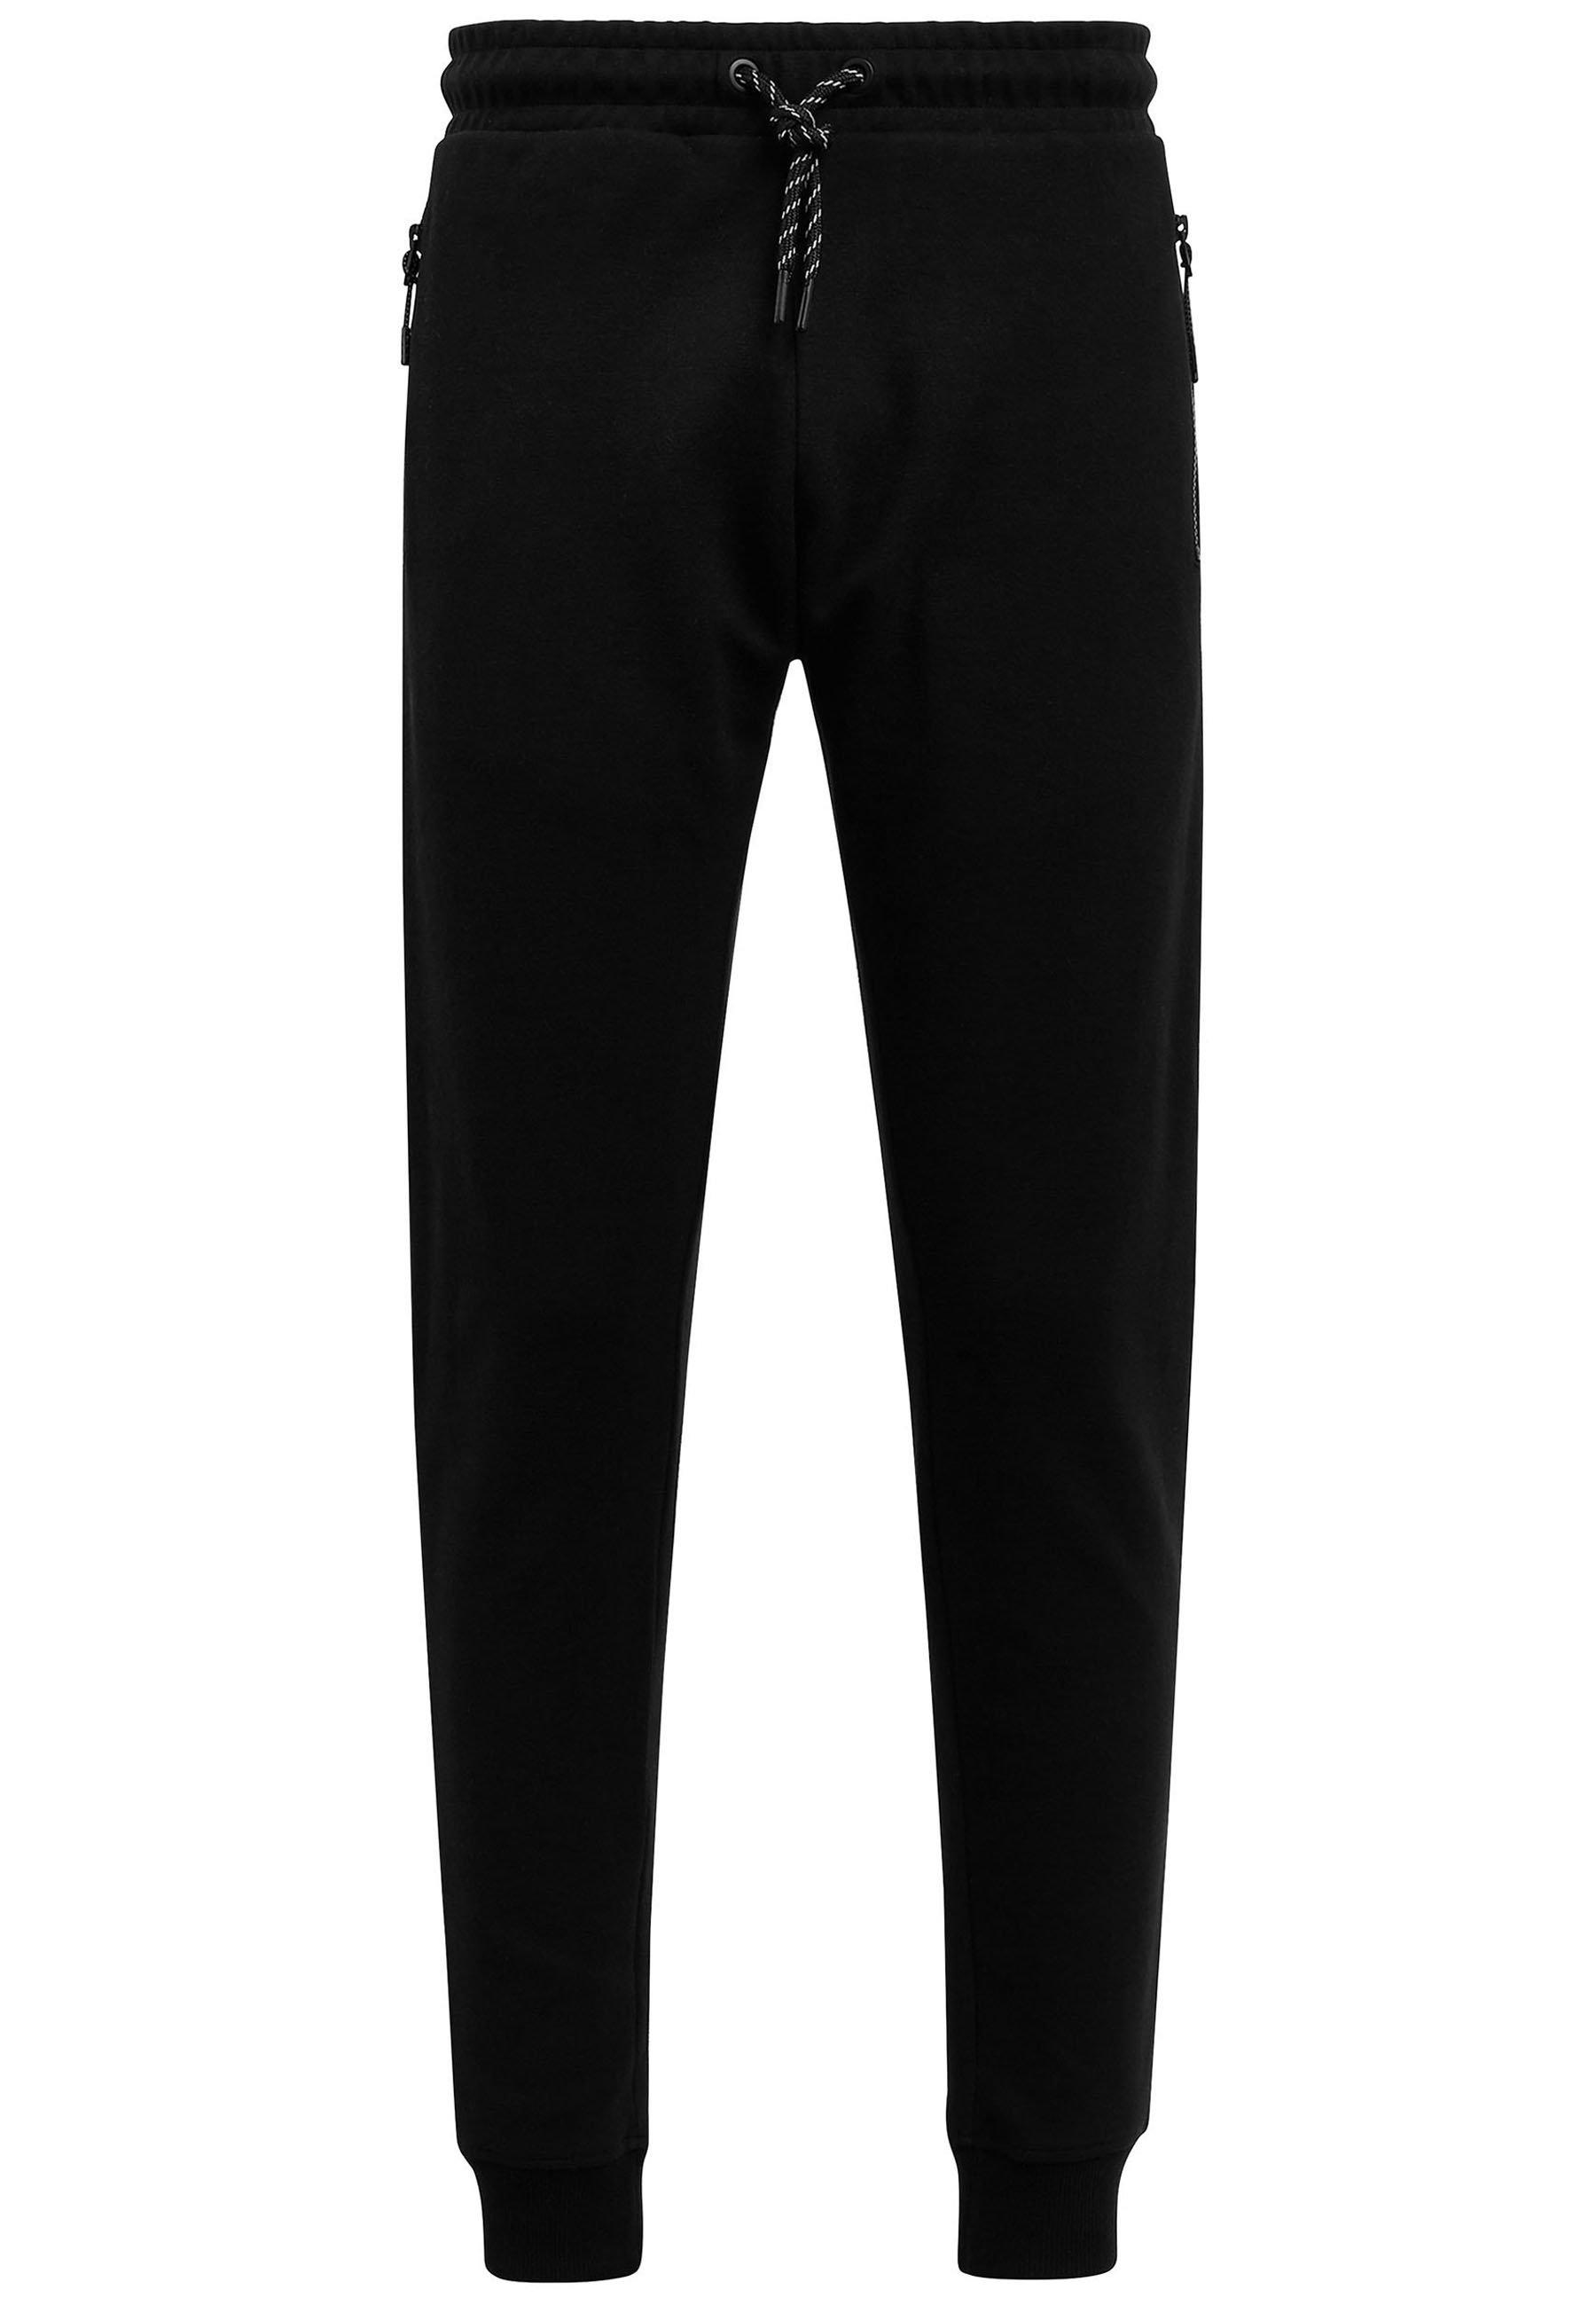 Homme BLACK SKINNY JOGGERS - Pantalon de survêtement